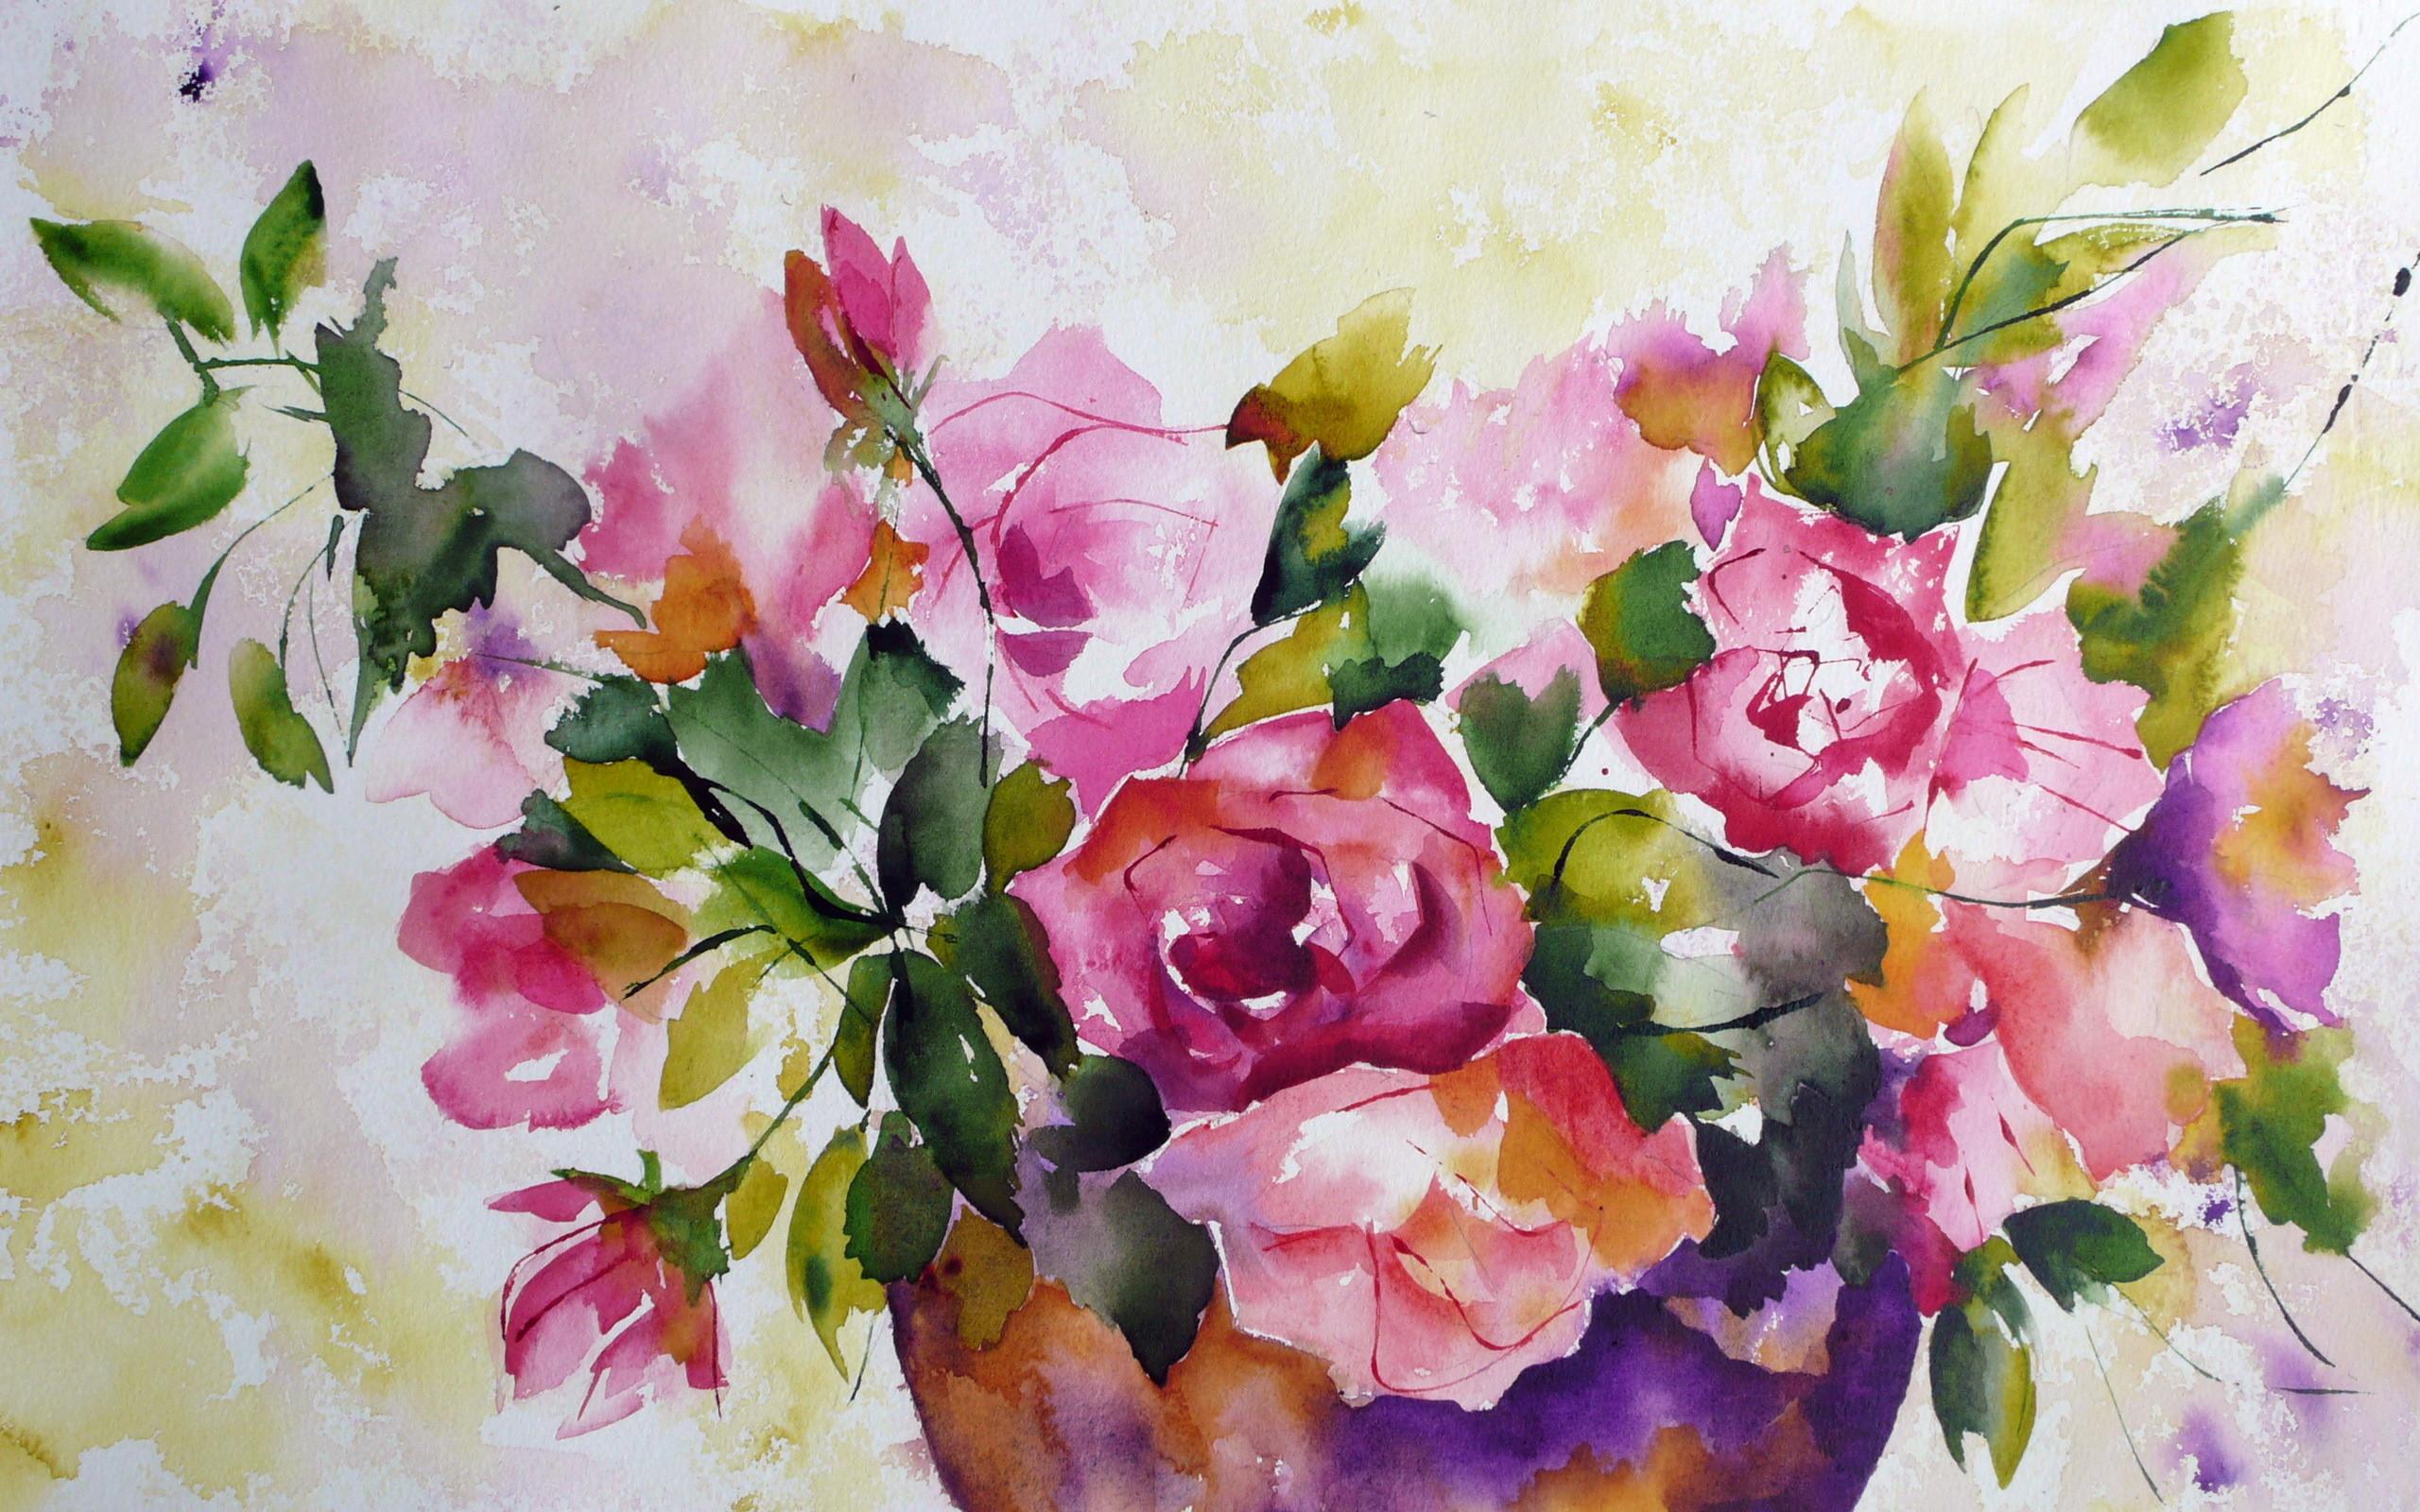 Flowers Watercolor Oil Painting Wallpaper Forwallpaper Com